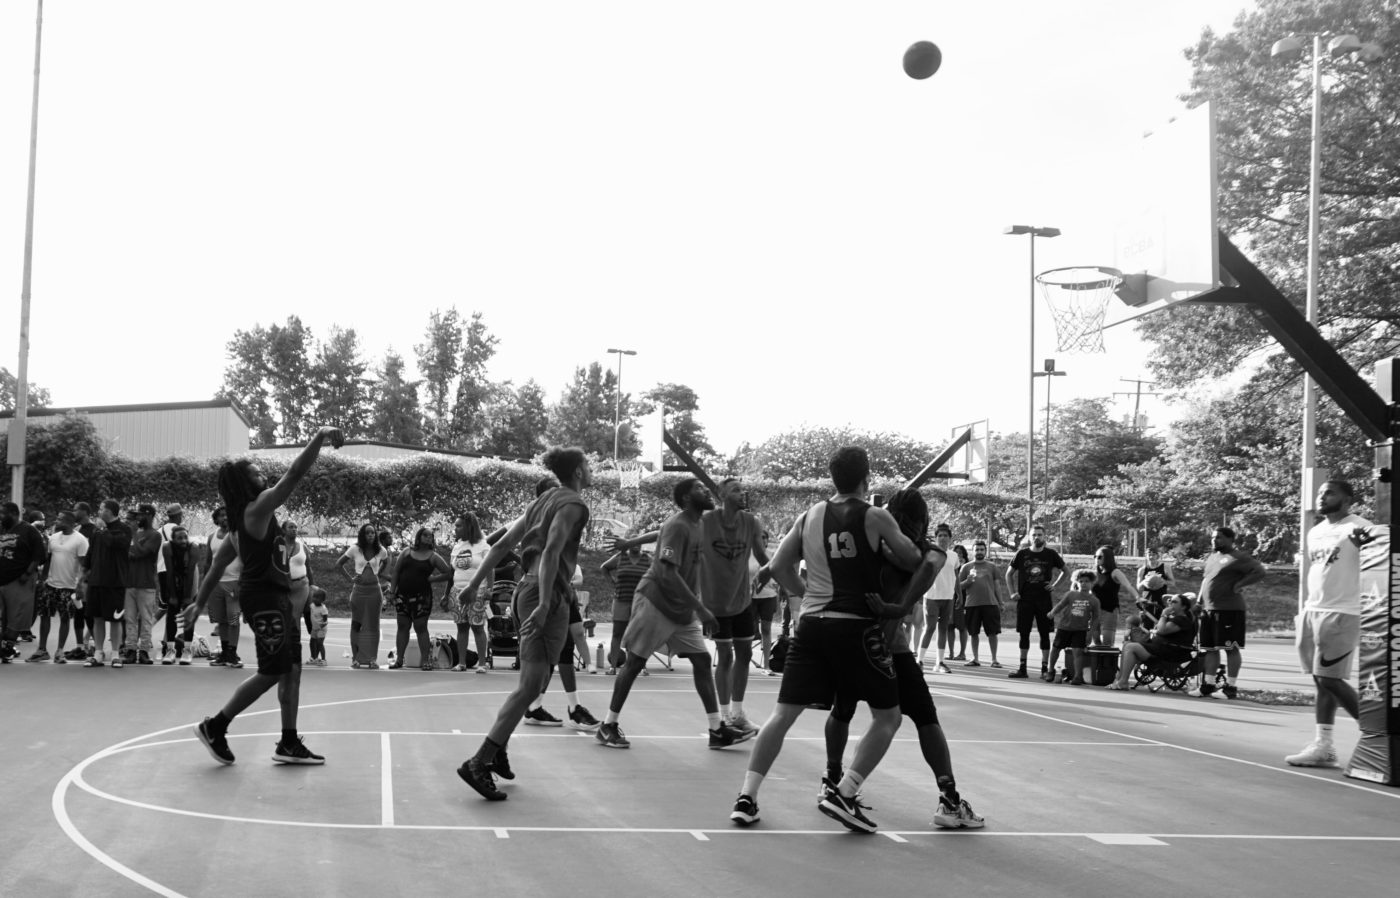 Summer basketball league returns to Tonsler Park